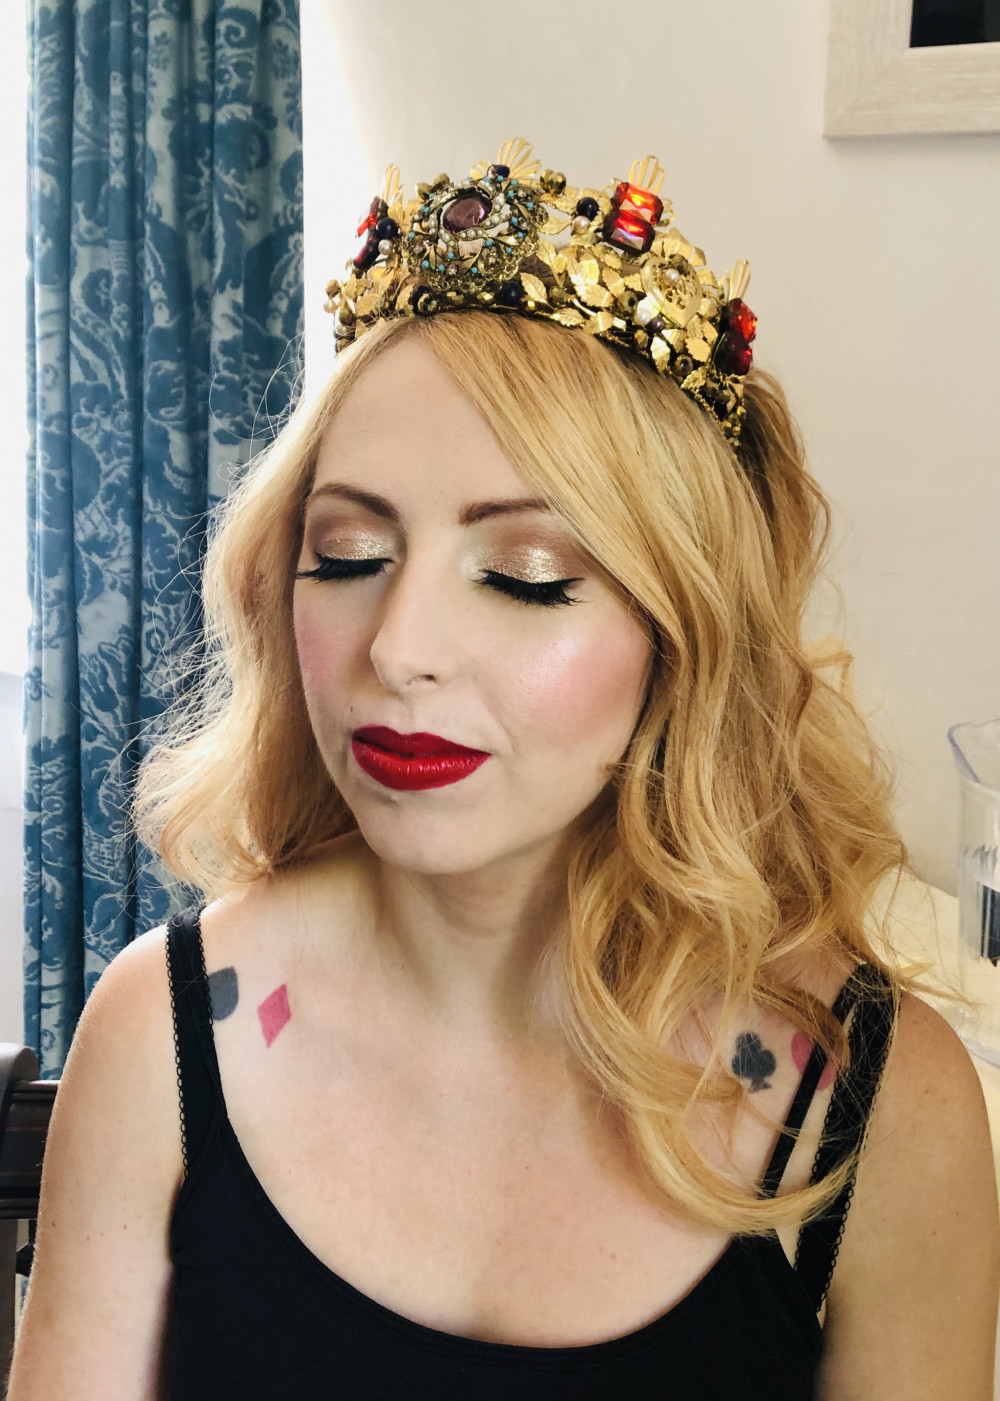 - Make Me Bridal Artist: Leanne Perilly Make-up Artist. #glamorous #bridalmakeup #coolbride #bridalmakeup #redhead #bridalmakeupartist #bride #redlip #bridalmakeupartistessex